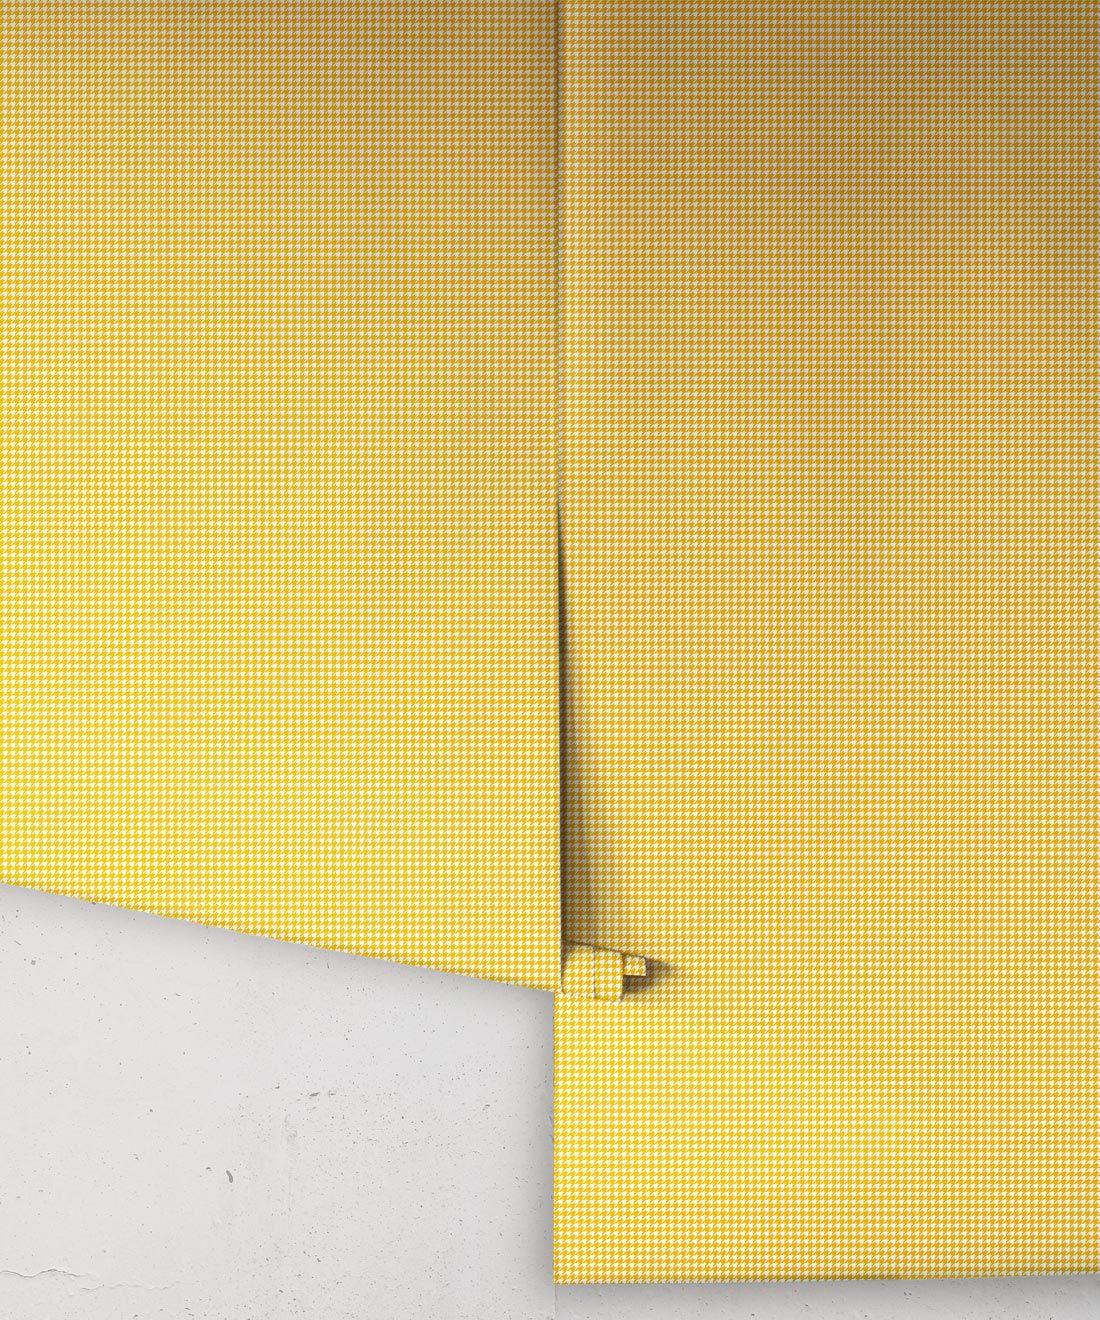 Houndstooth Wallpaper • Dogstooth Wallpaper • Sunshine Yellow Wallpaper •Rolls